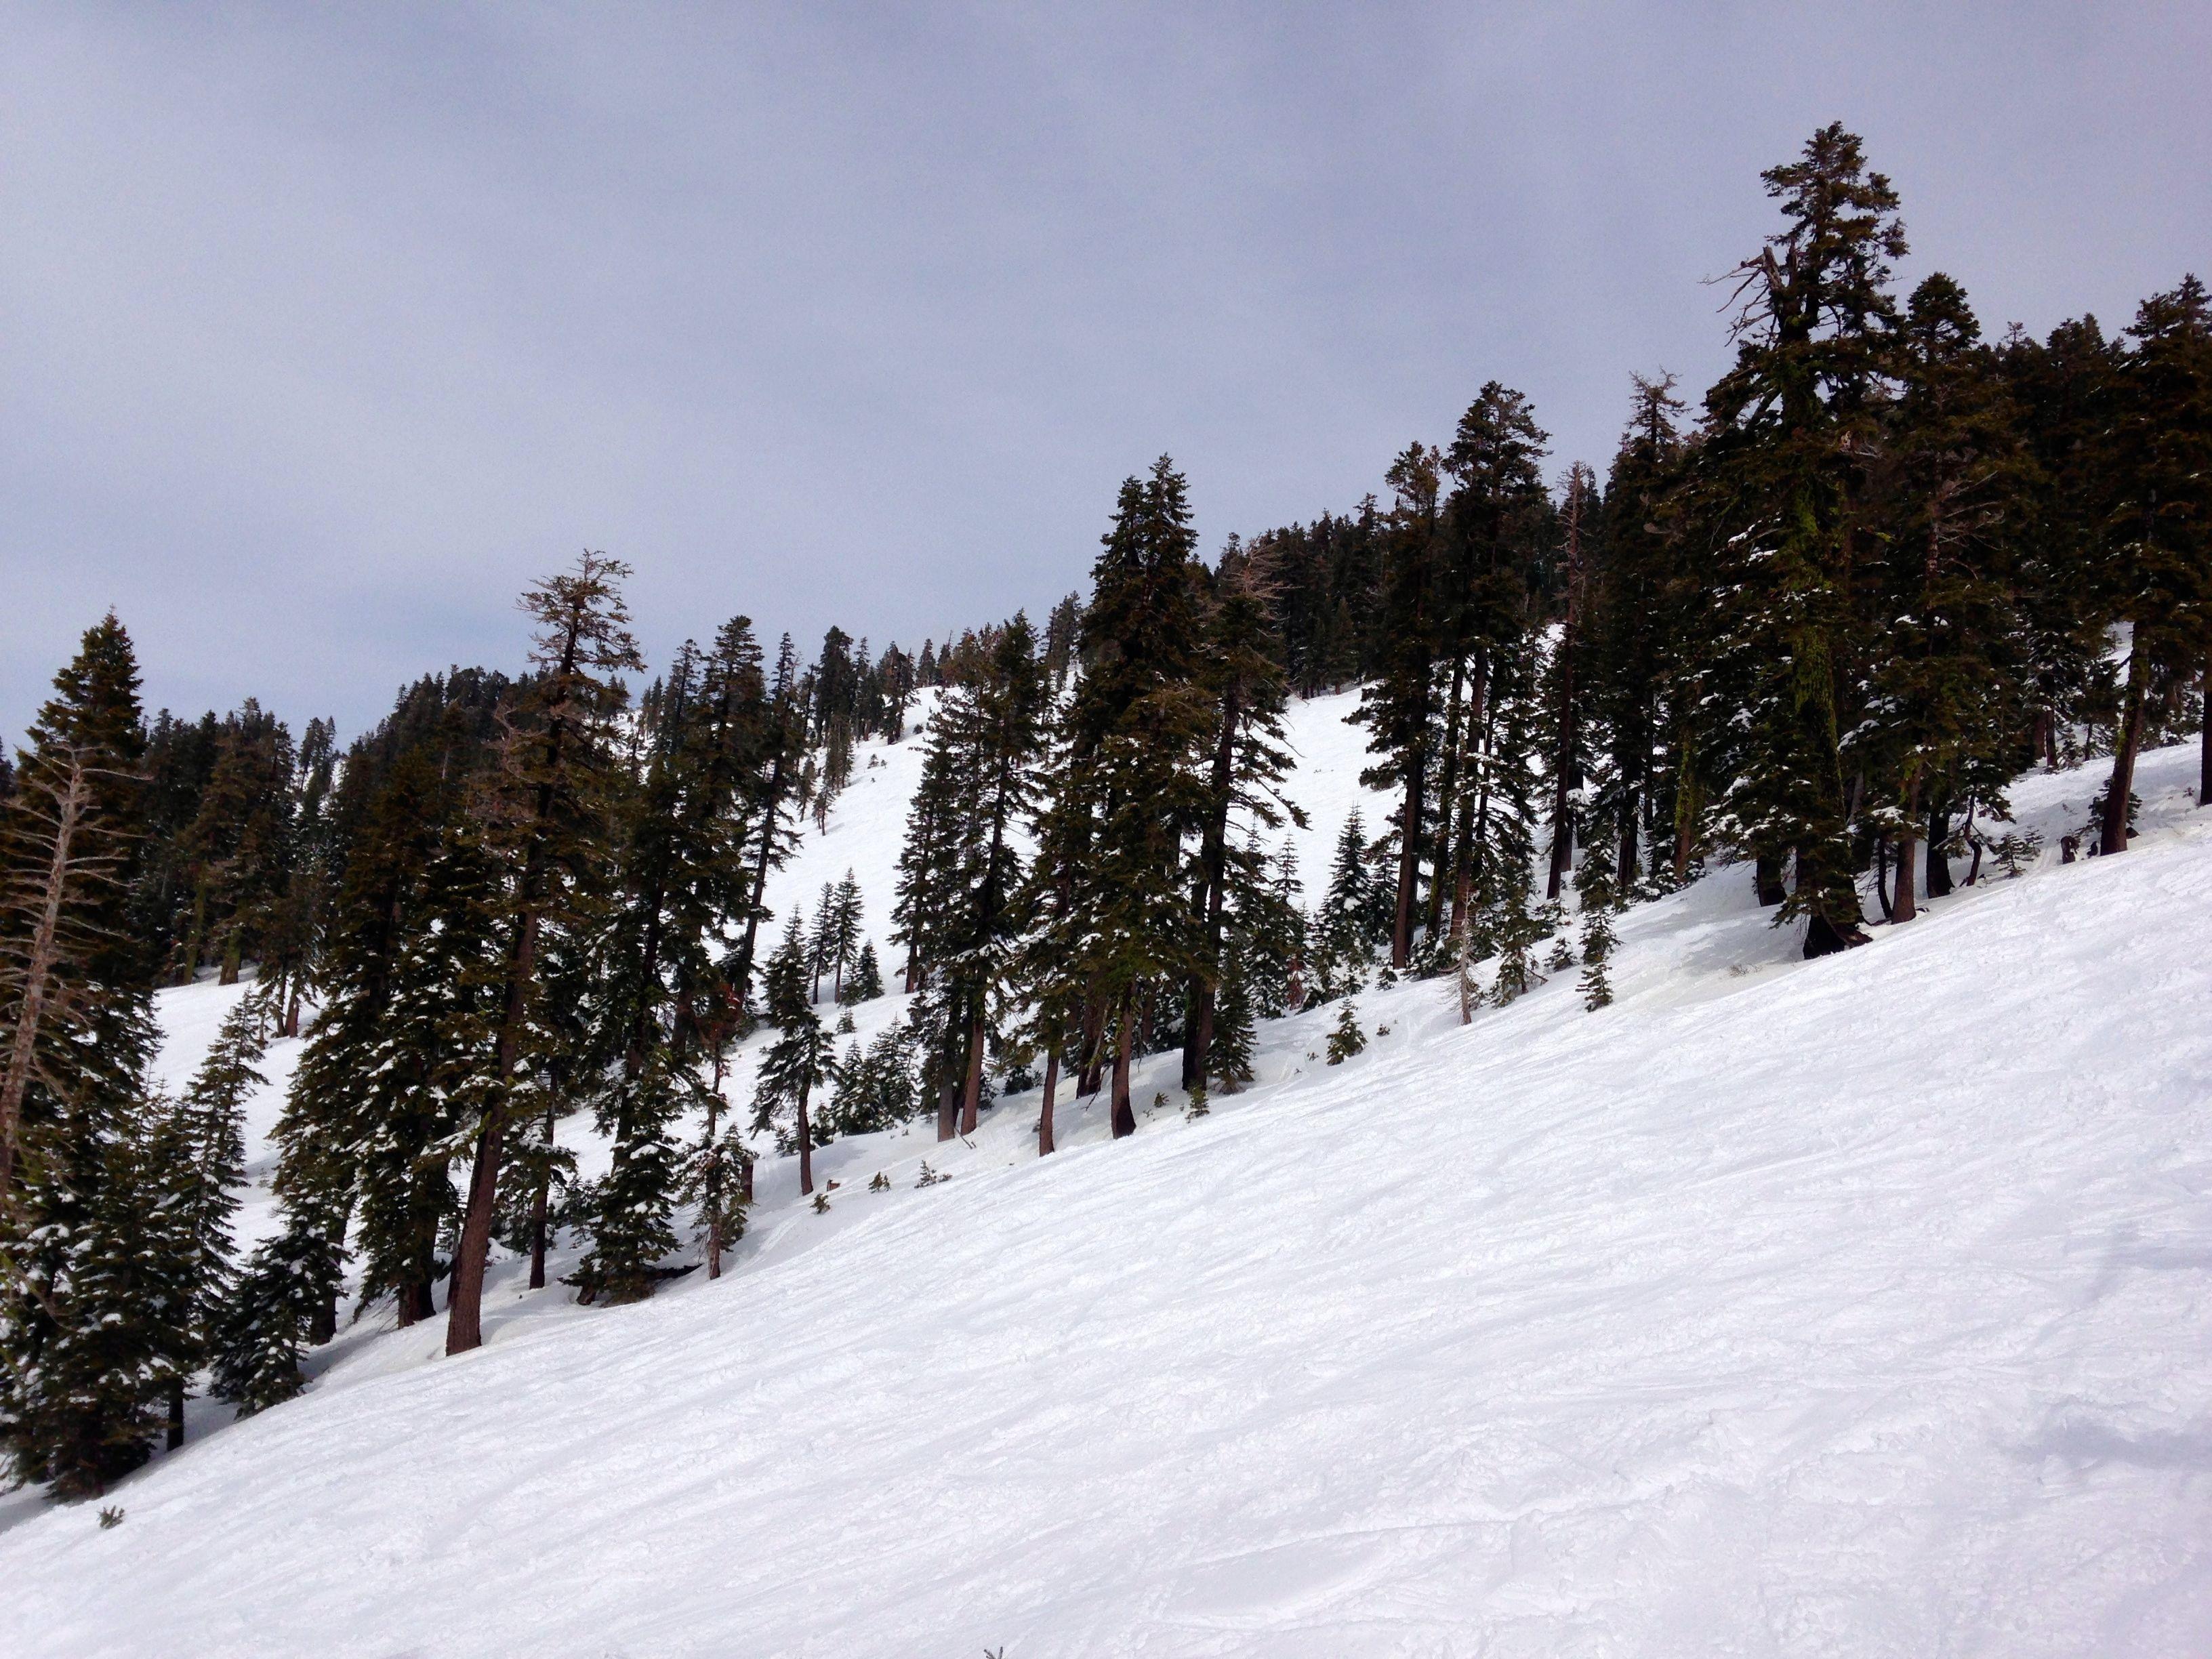 Slopes at Alpine Meadows, Lake Tahoe CA